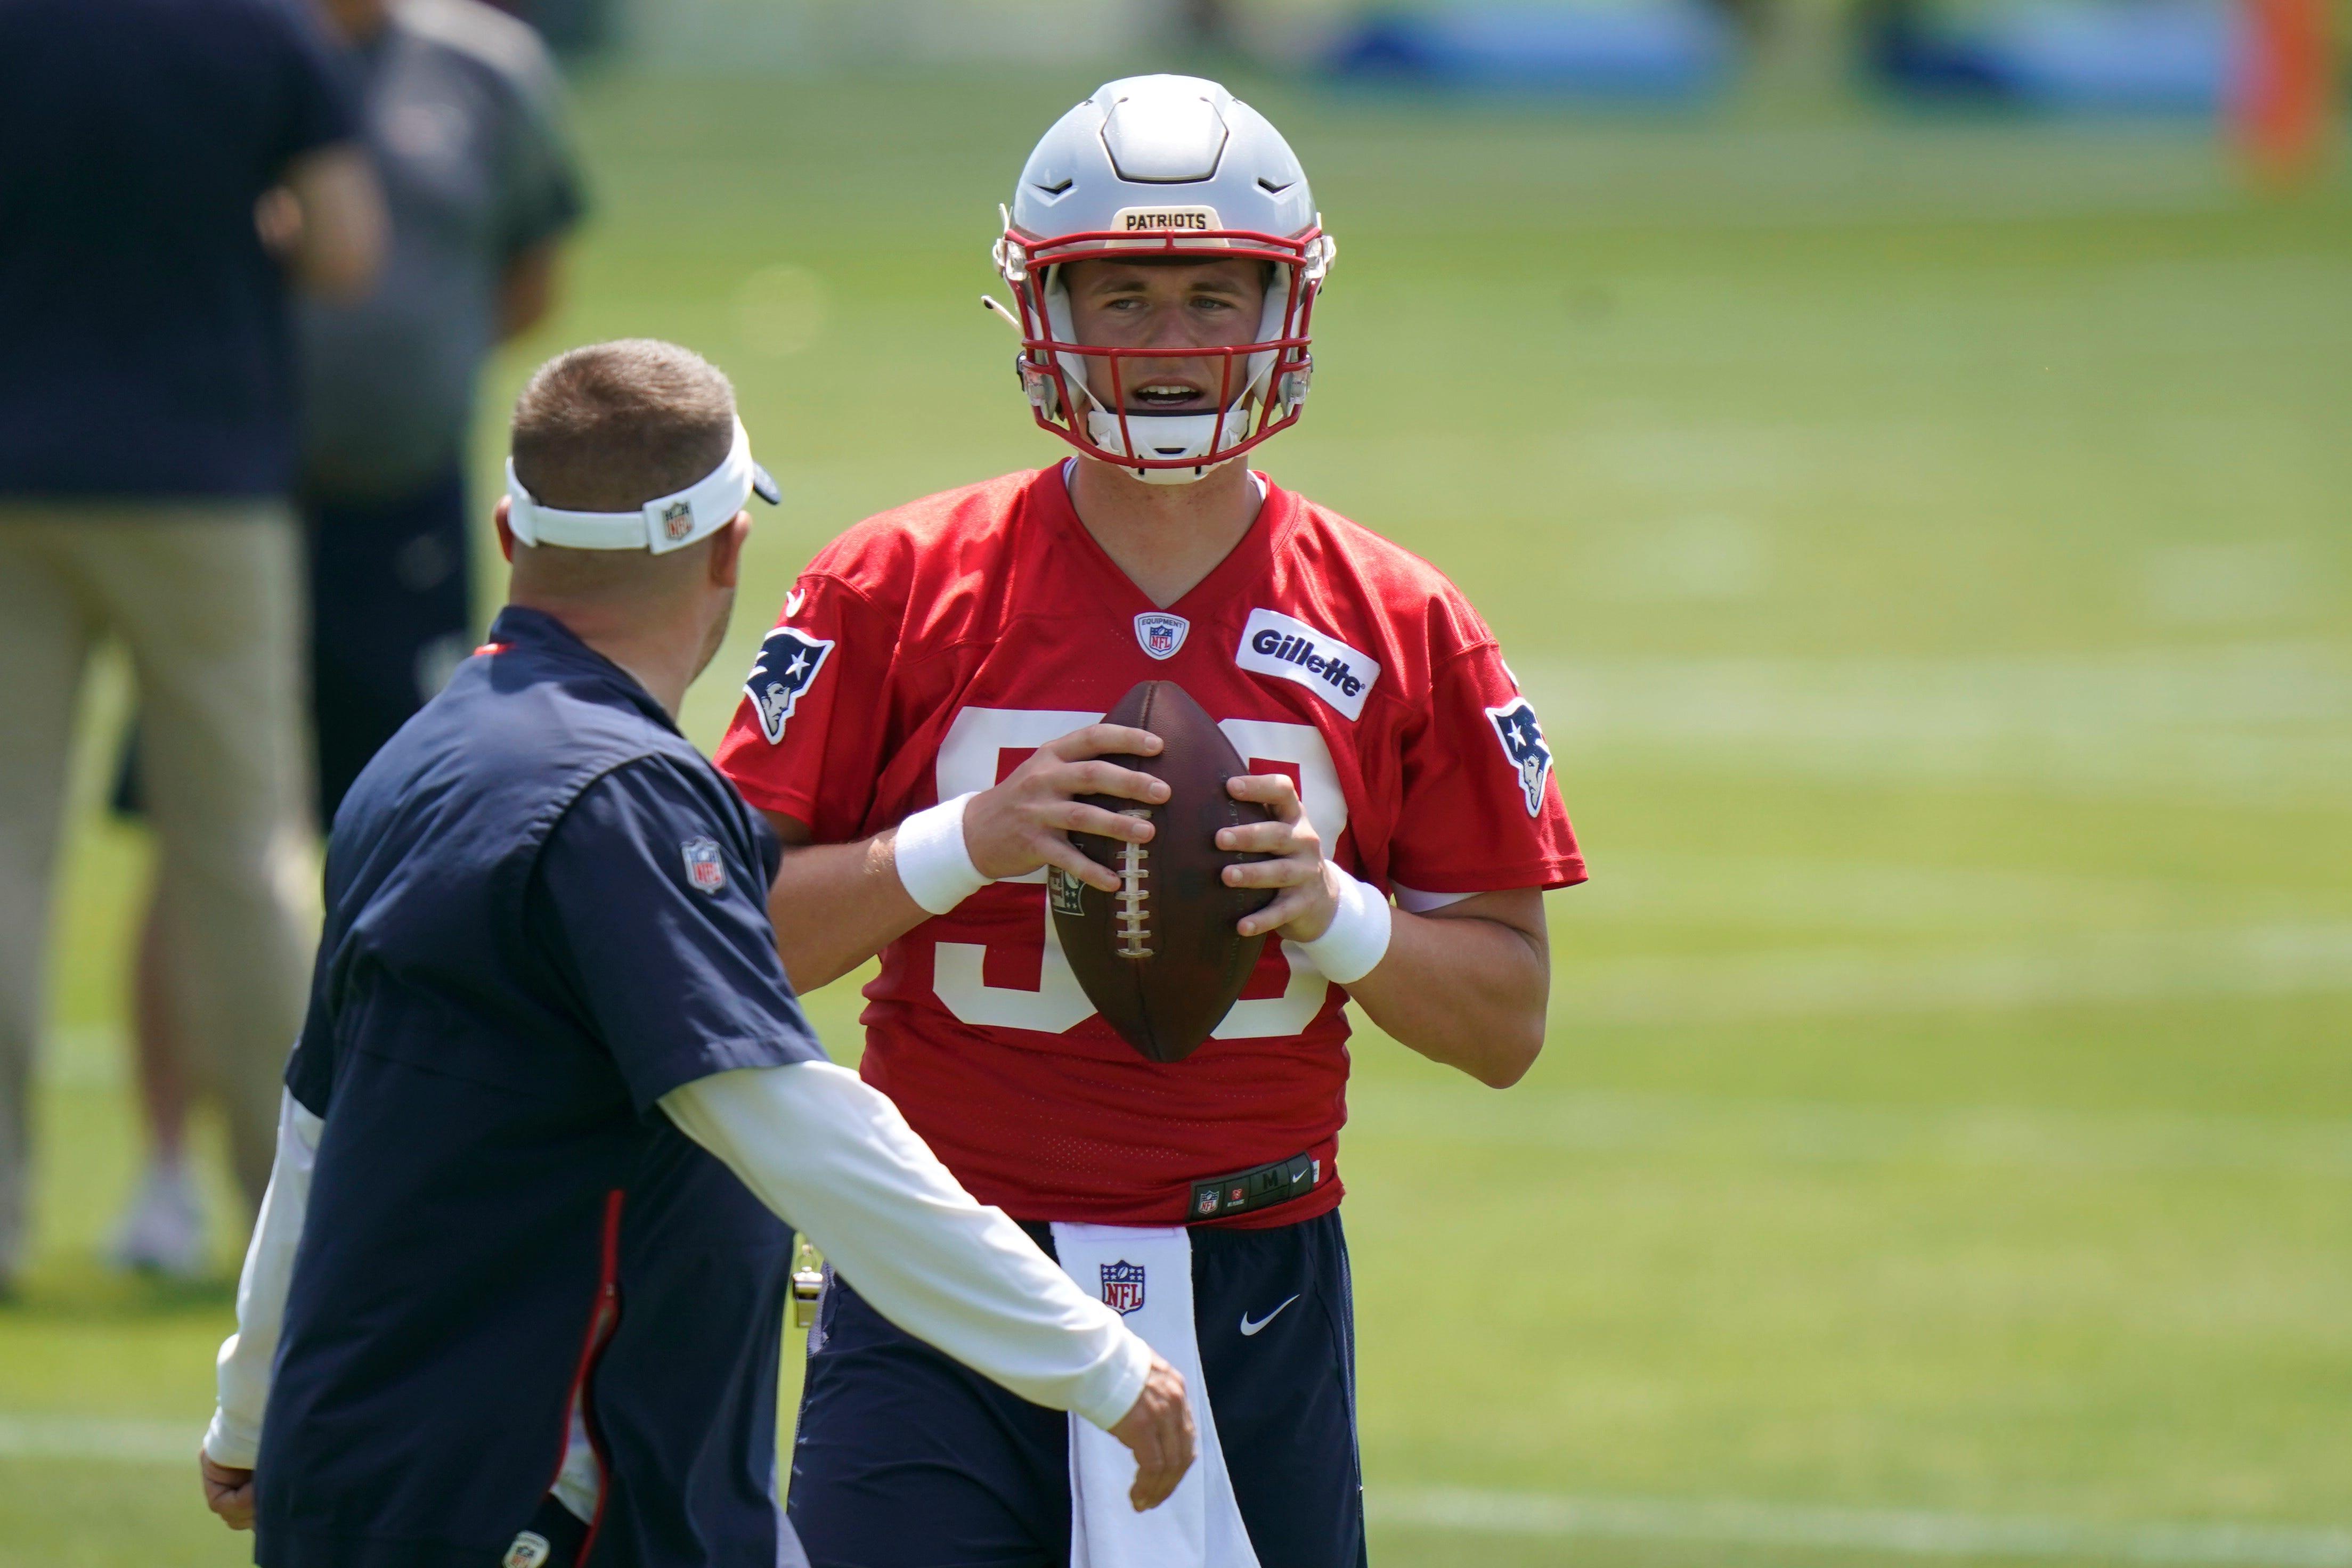 Bill Belichick: Patriots rookie QB Mac Jones has already 'earned a lot of respect'